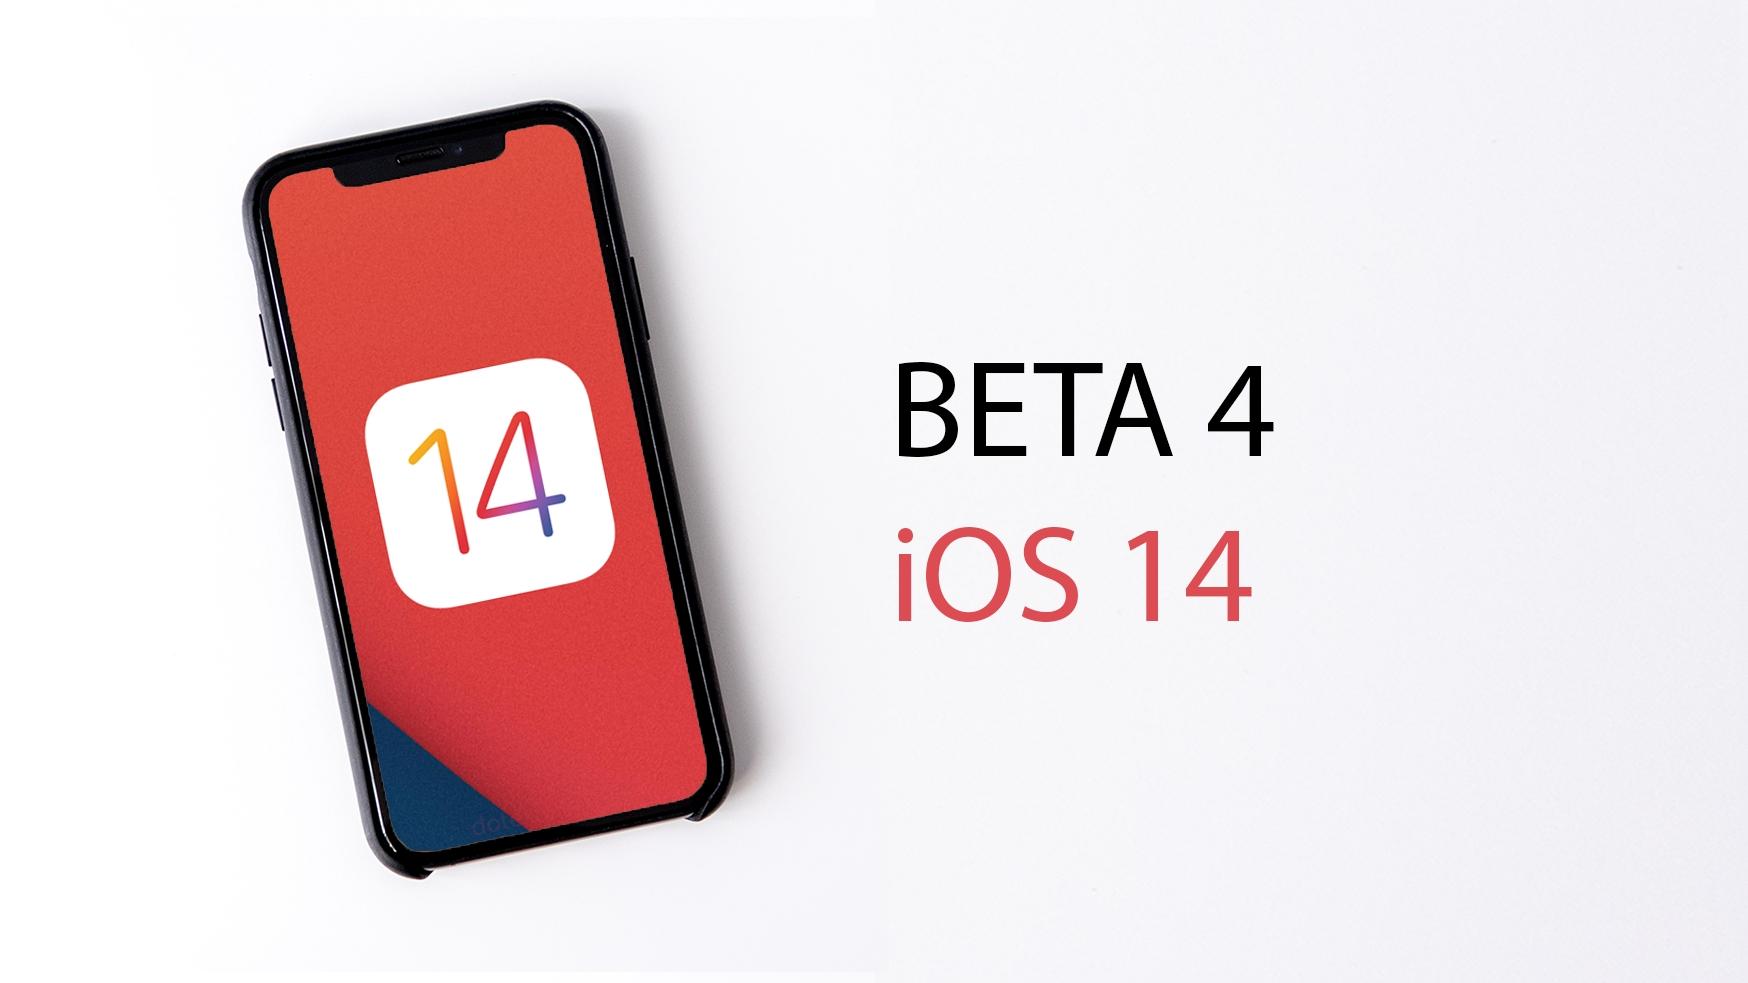 Apple vydal čtvrtou betaverzi iOS 14, přináší drobné úpravy a nový widget